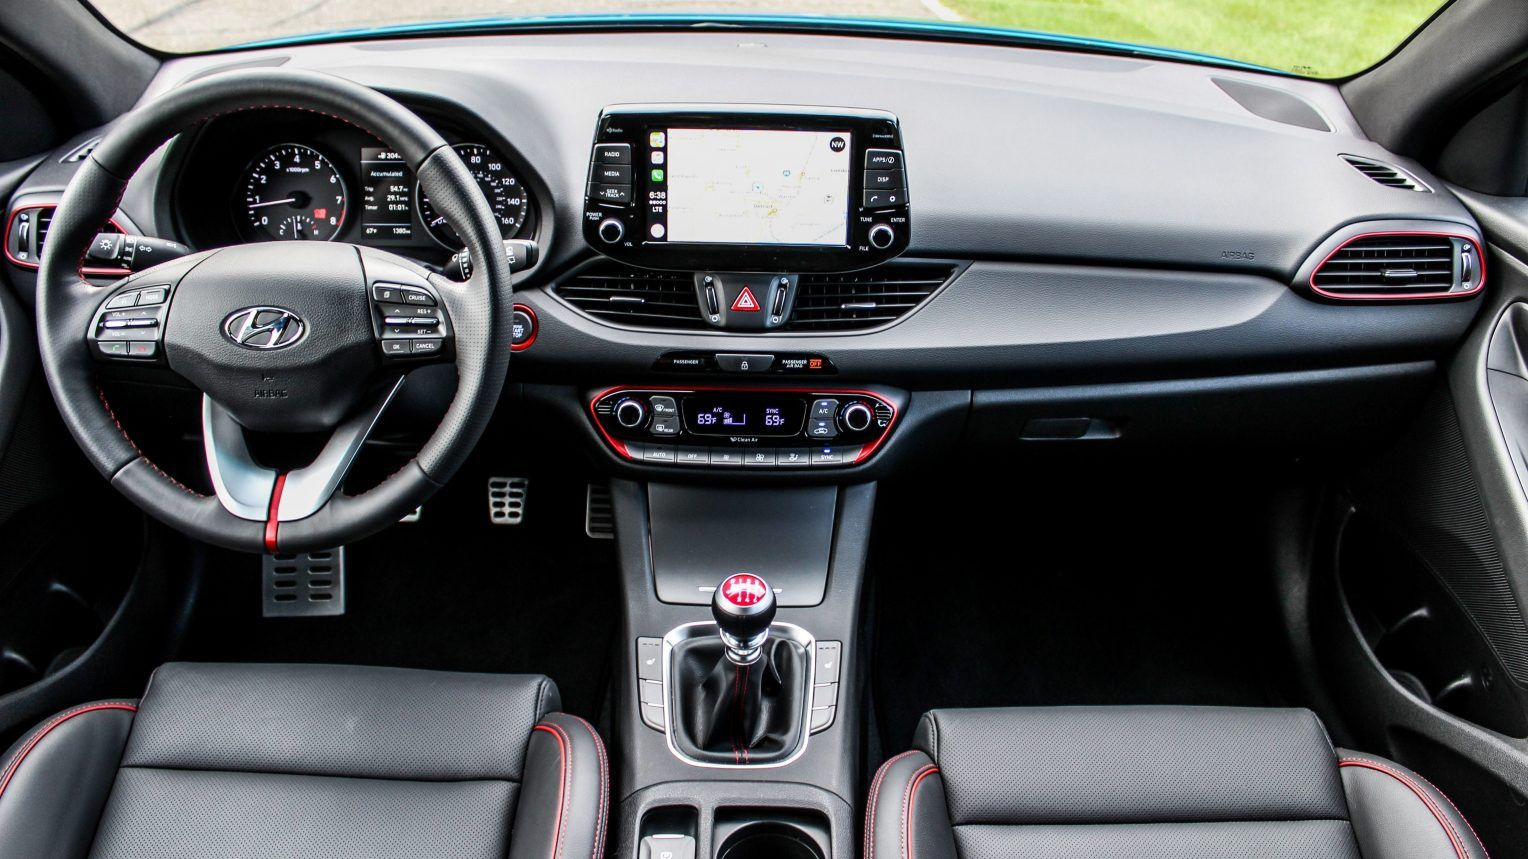 Image result for 2019 Hyundai Elantra. all sports cars